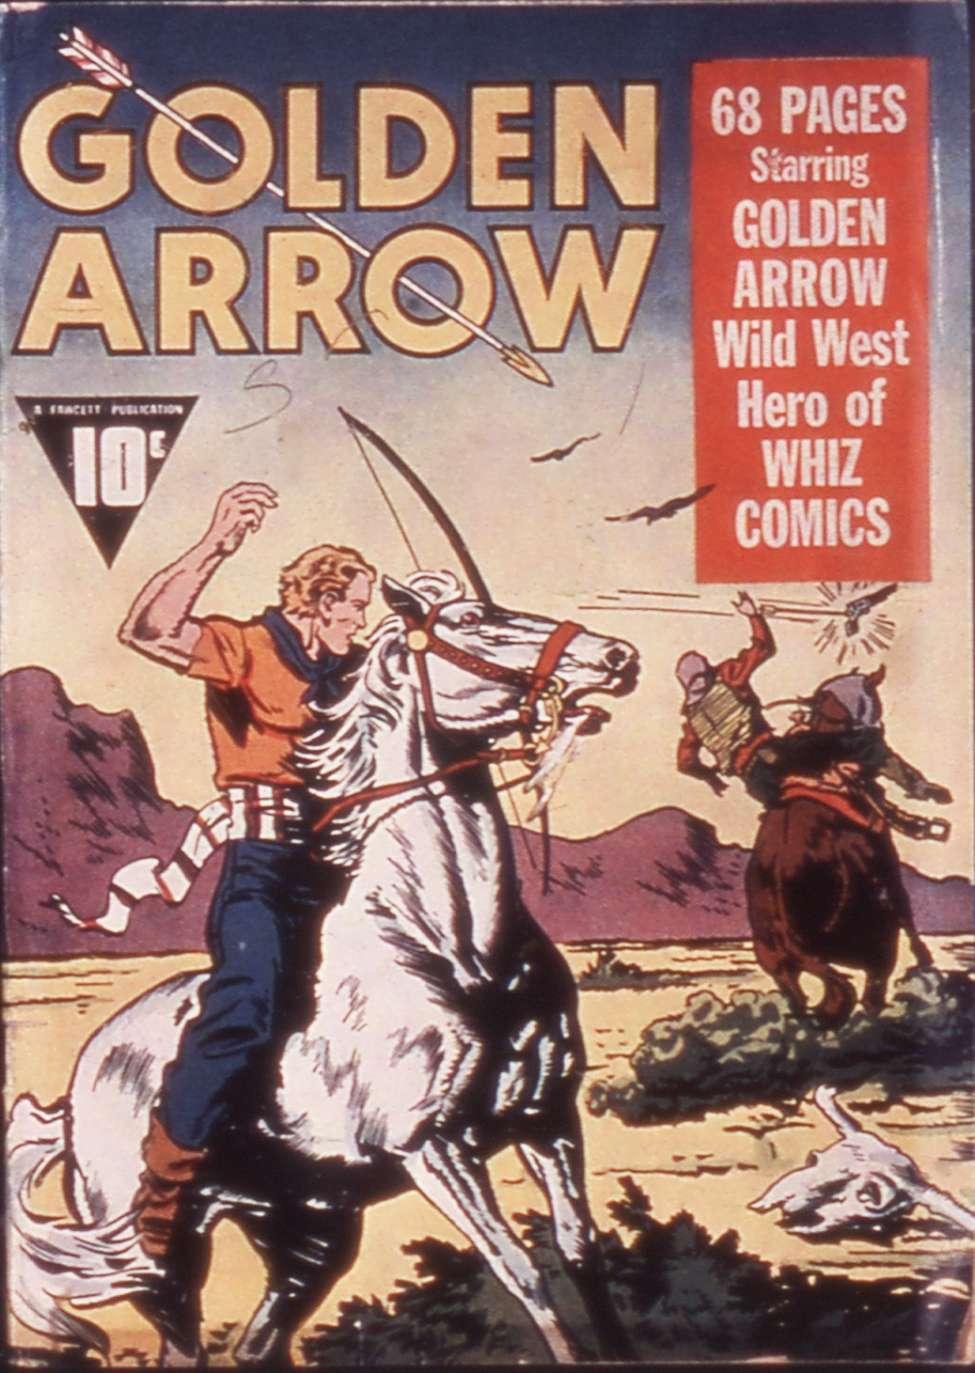 Comic Book Cover For Golden Arrow [1]